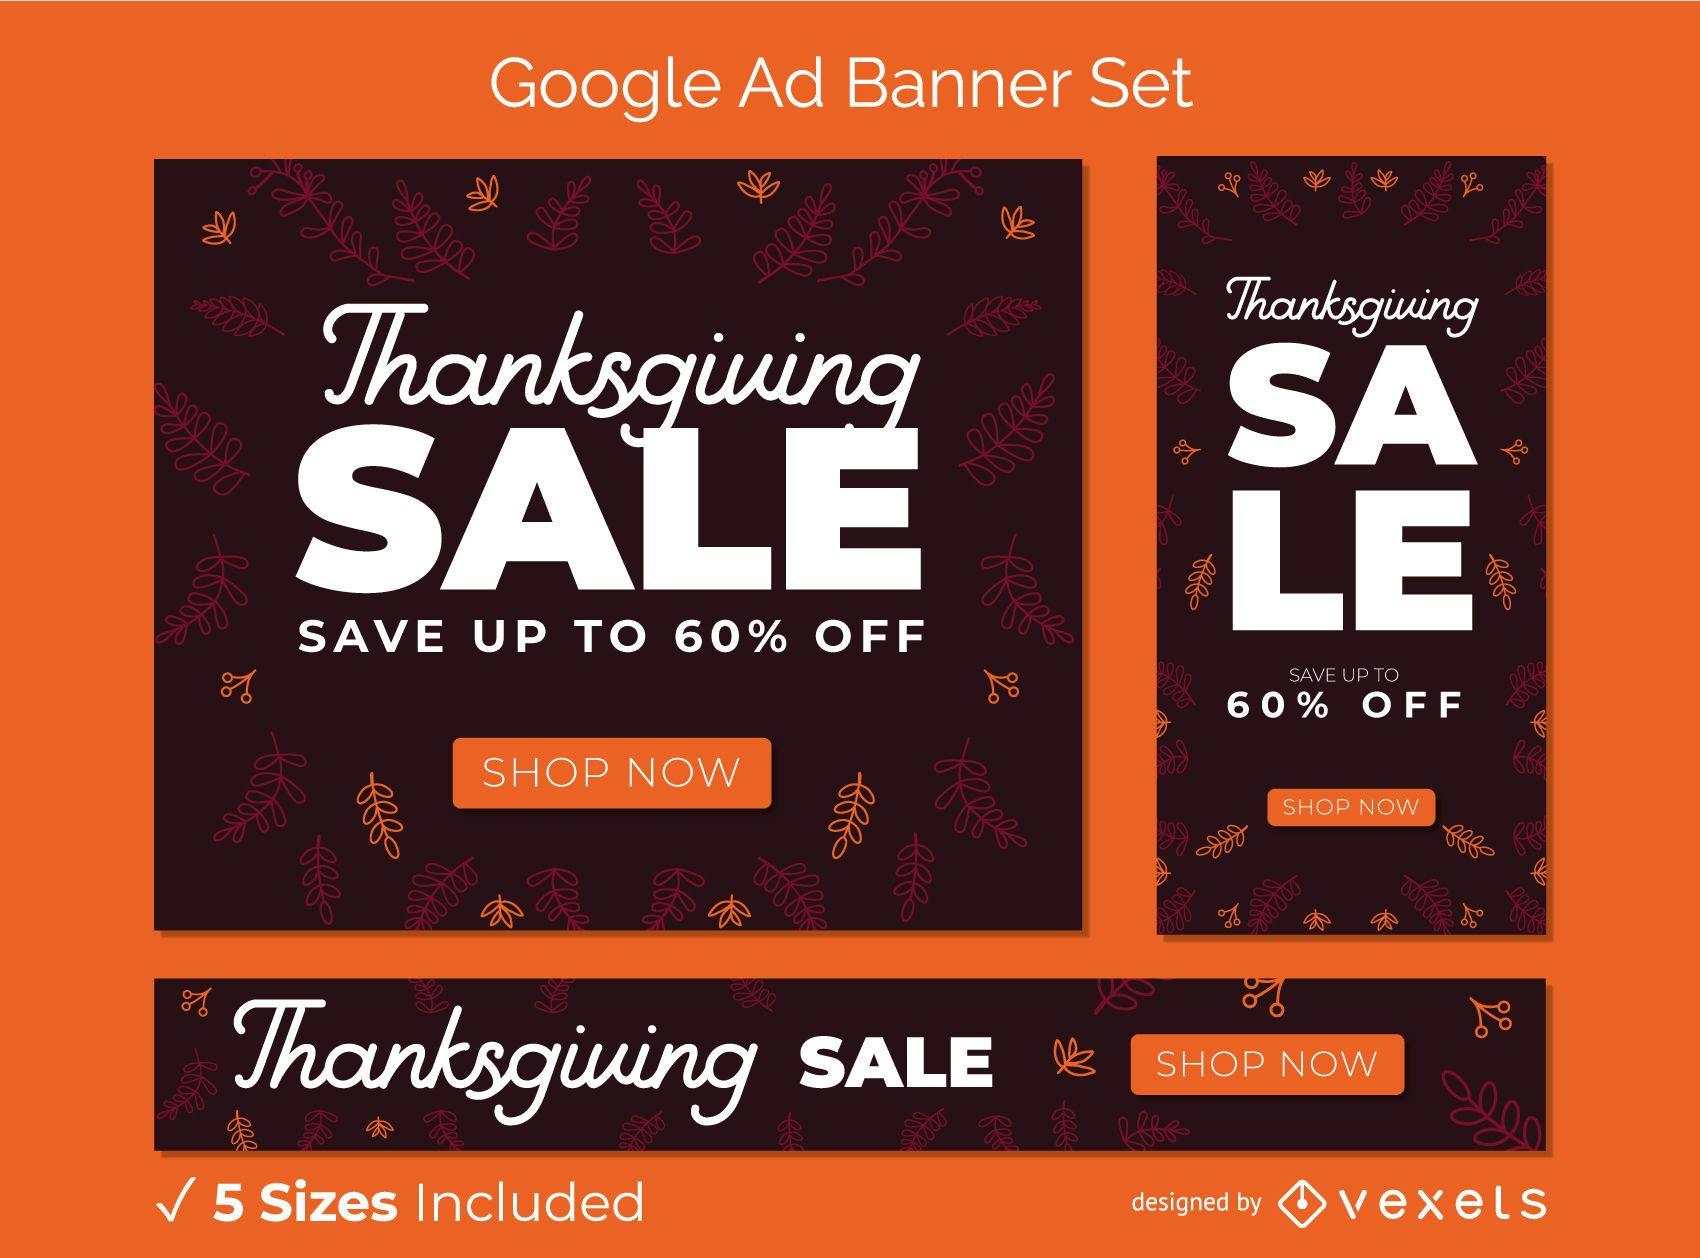 Thanksgiving Sale Google Ad Banner Set